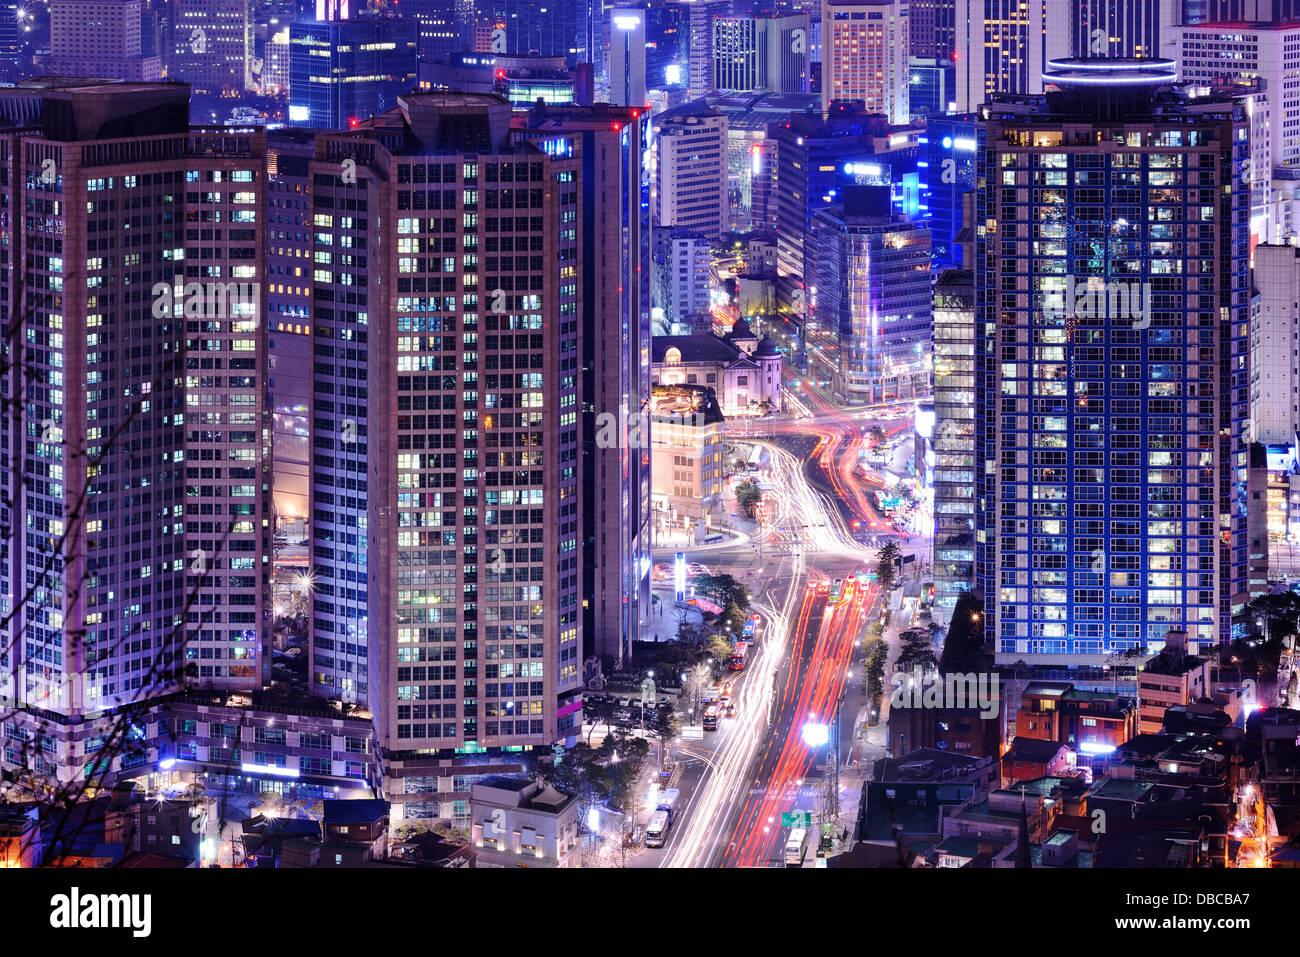 Stadtbild von Seoul, Südkorea. Stockbild